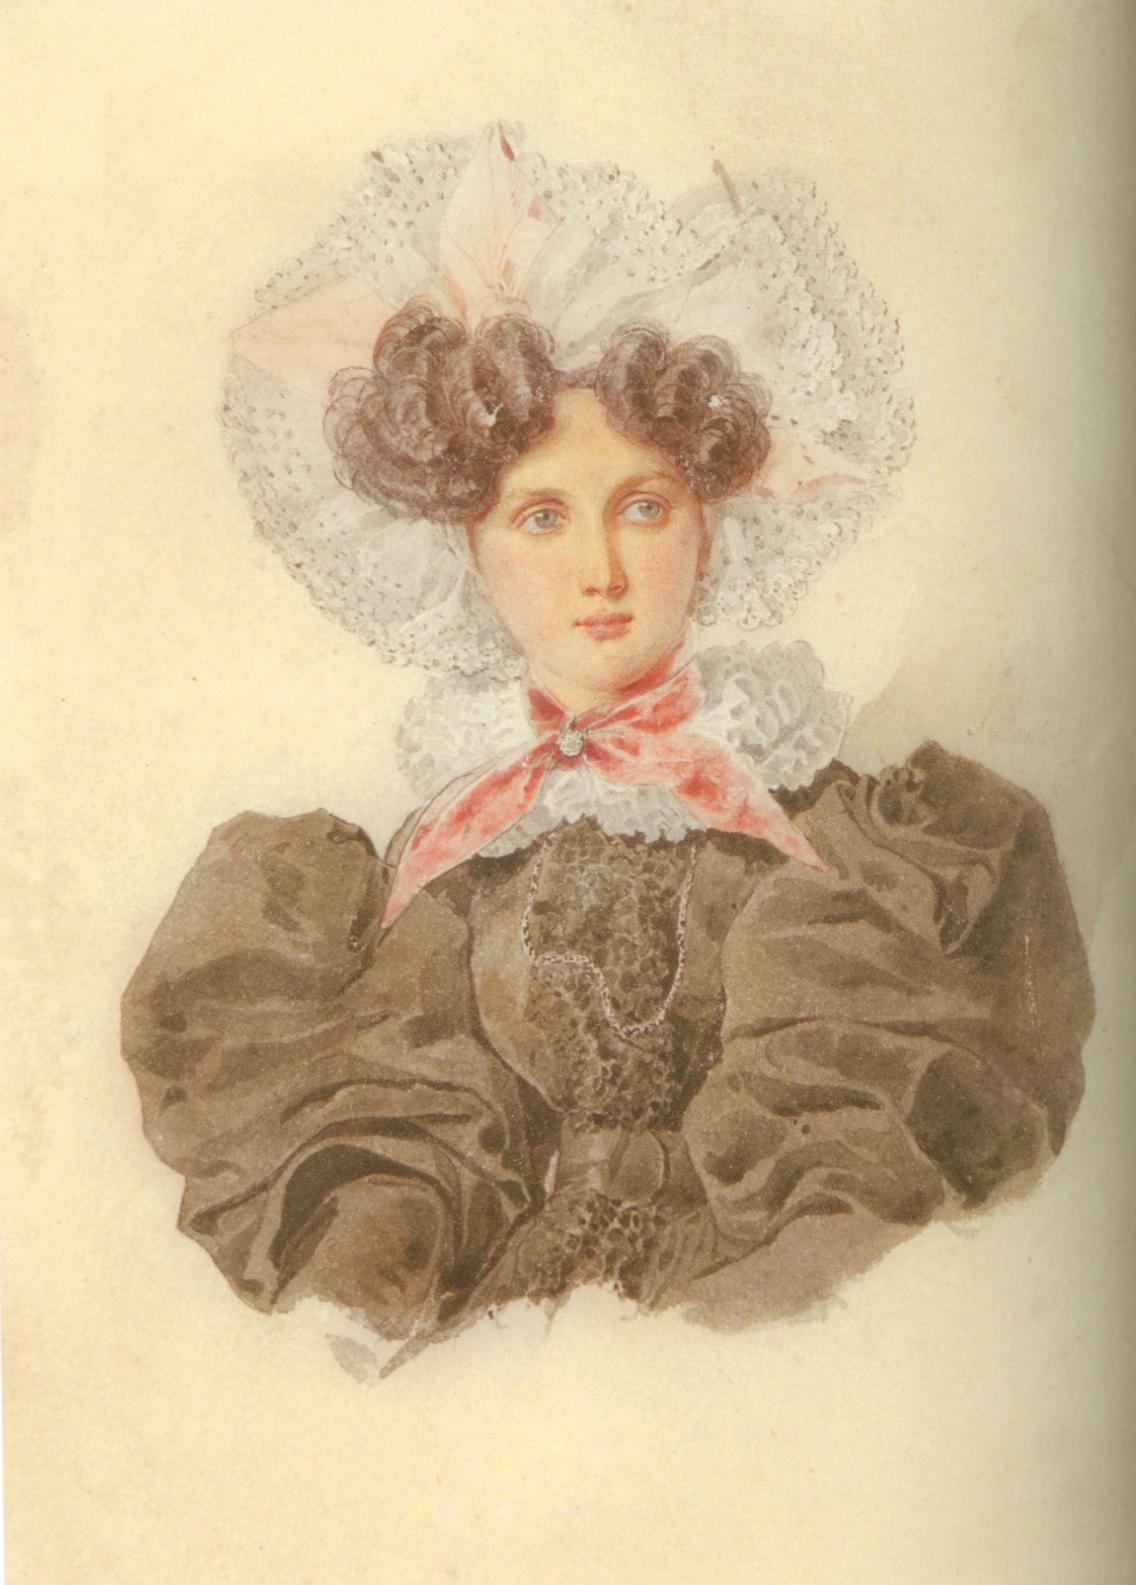 https://upload.wikimedia.org/wikipedia/commons/8/88/Olga_Pavlovna_Alexander_Brullov.jpg